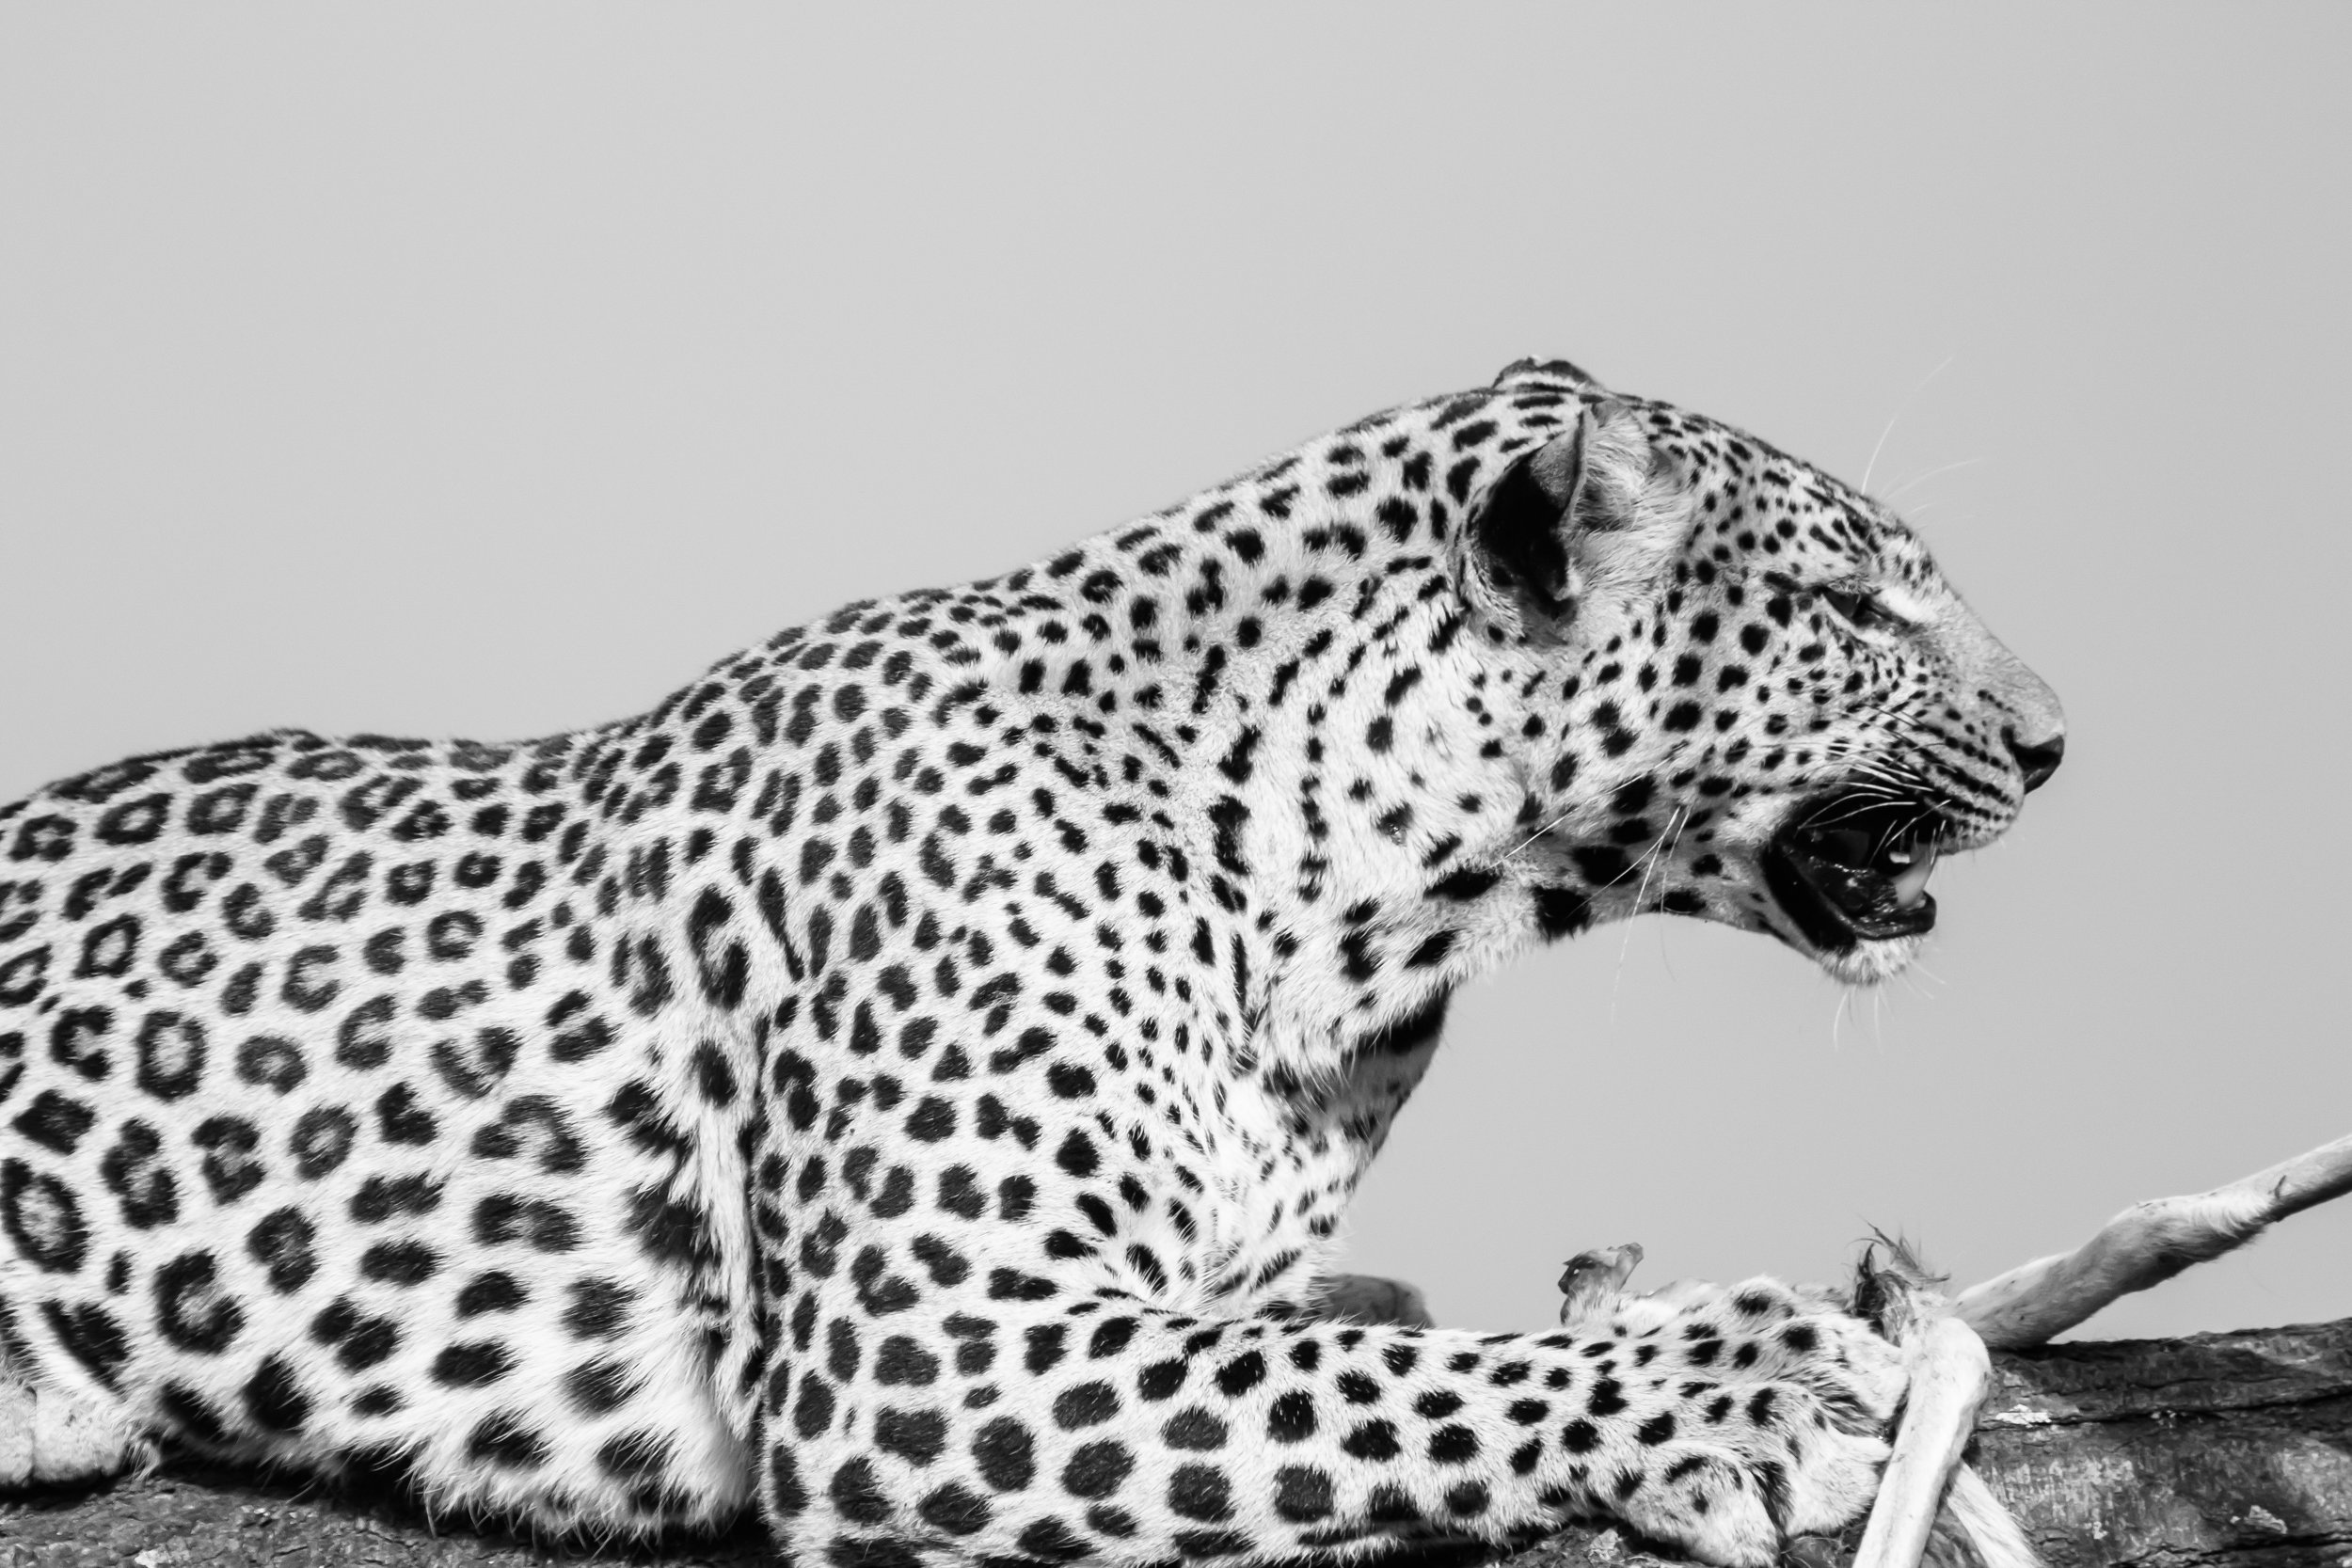 Animals_Website_Maxblakesberg-19.jpg